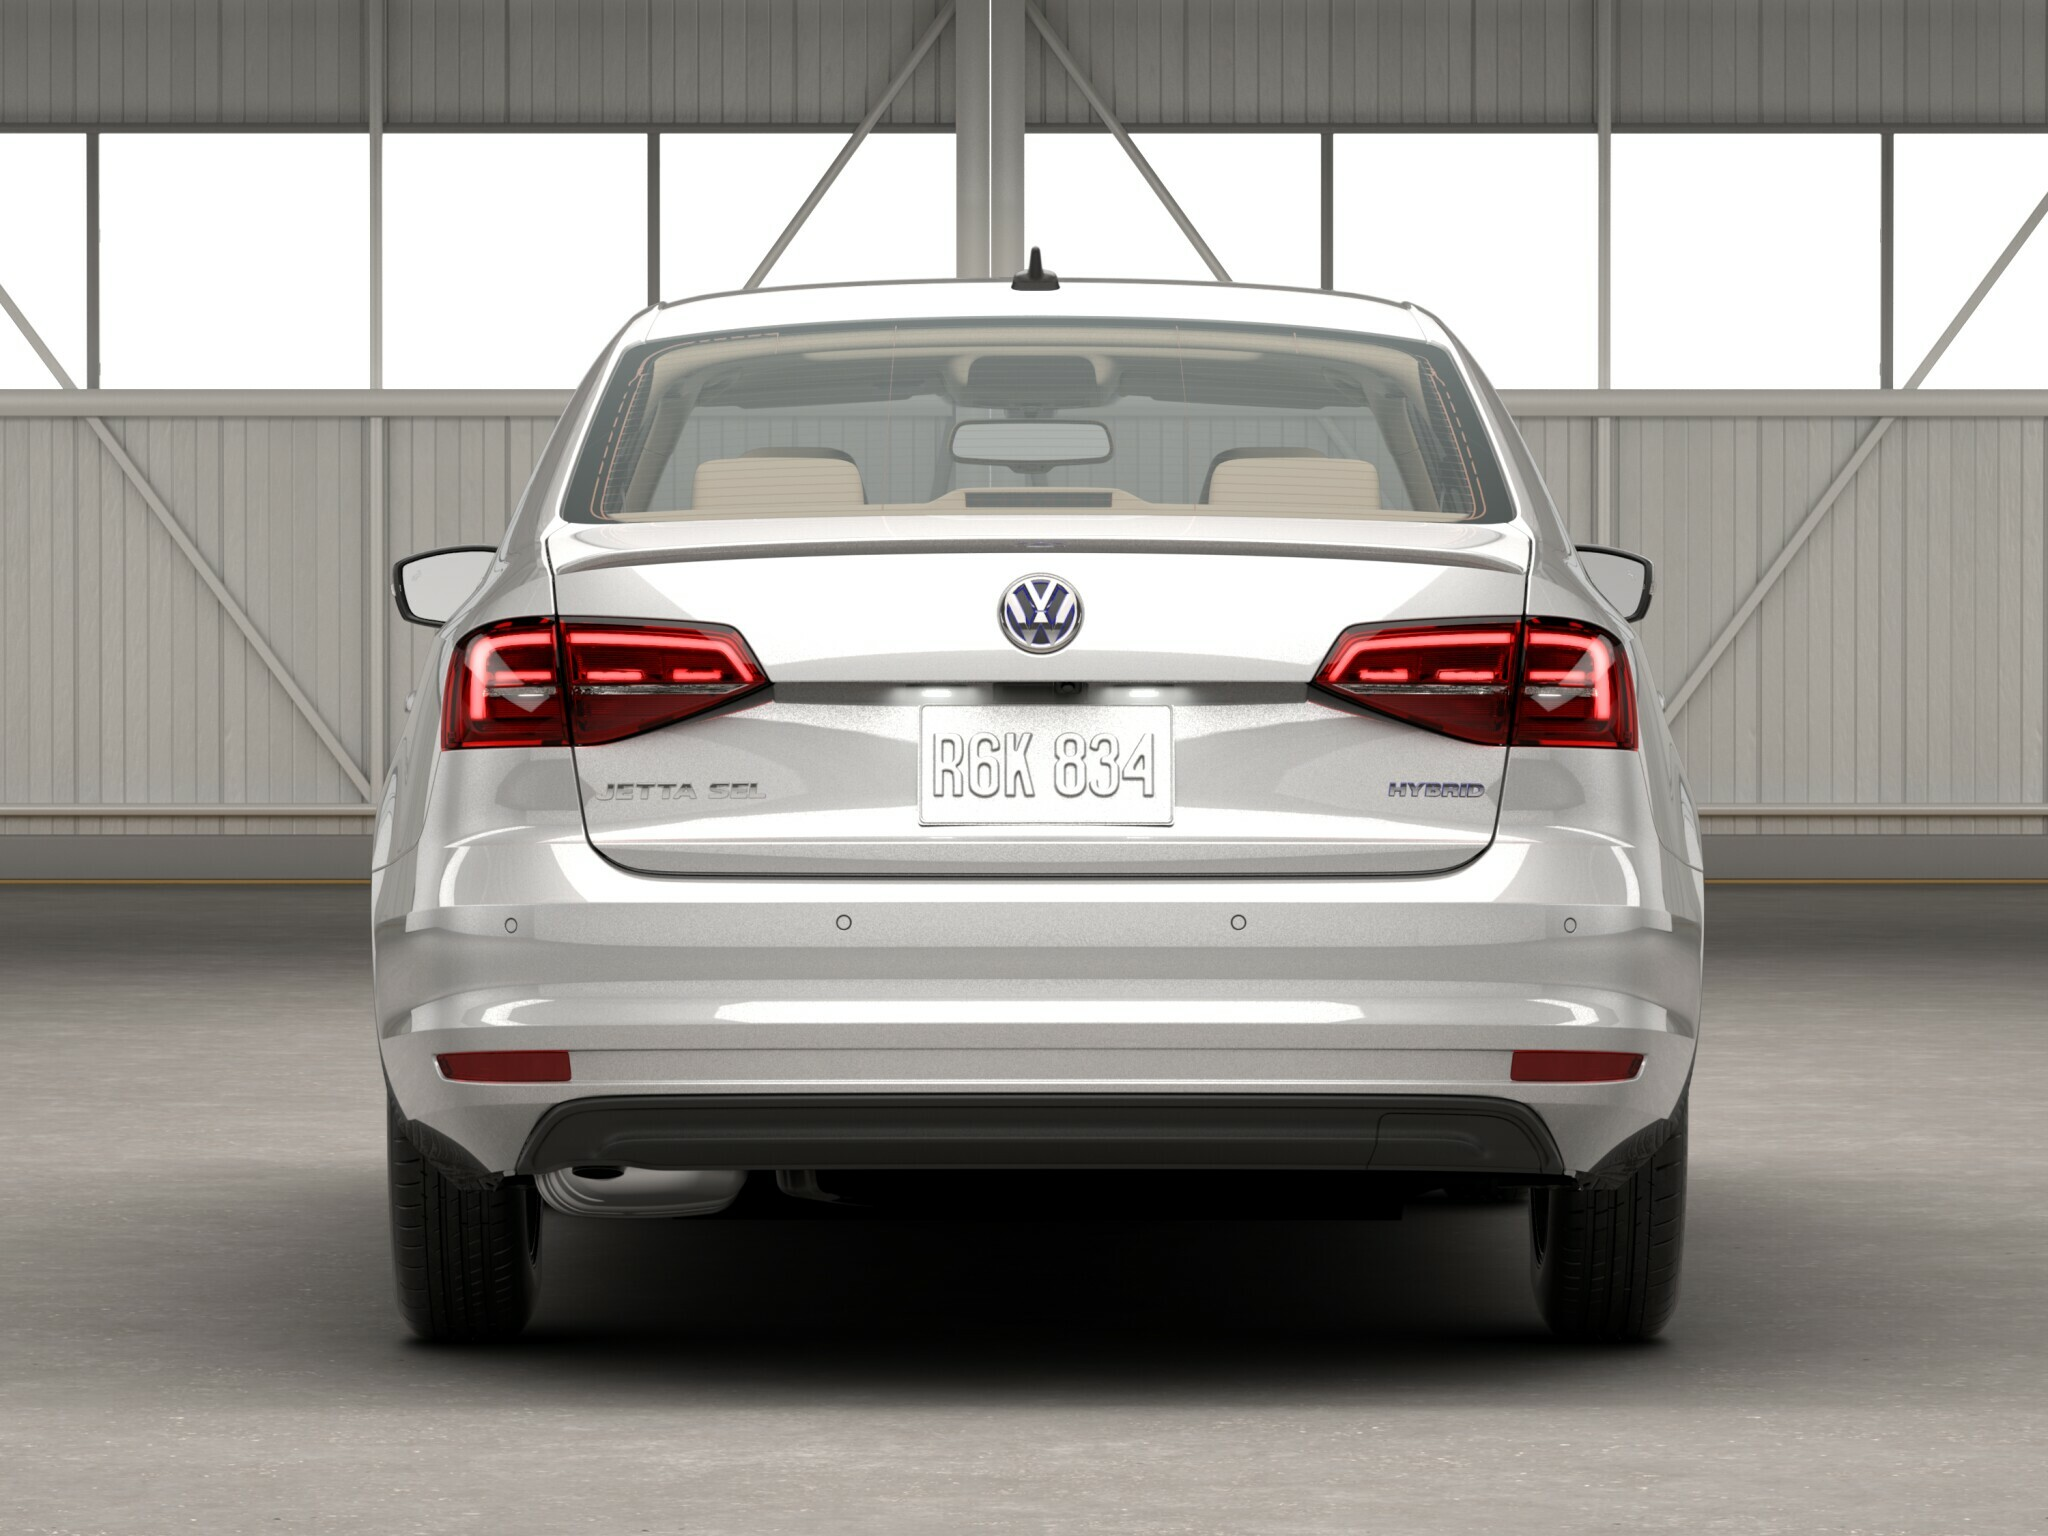 2016 Volkswagen Jetta Hybrid Cars German Source Vwimg